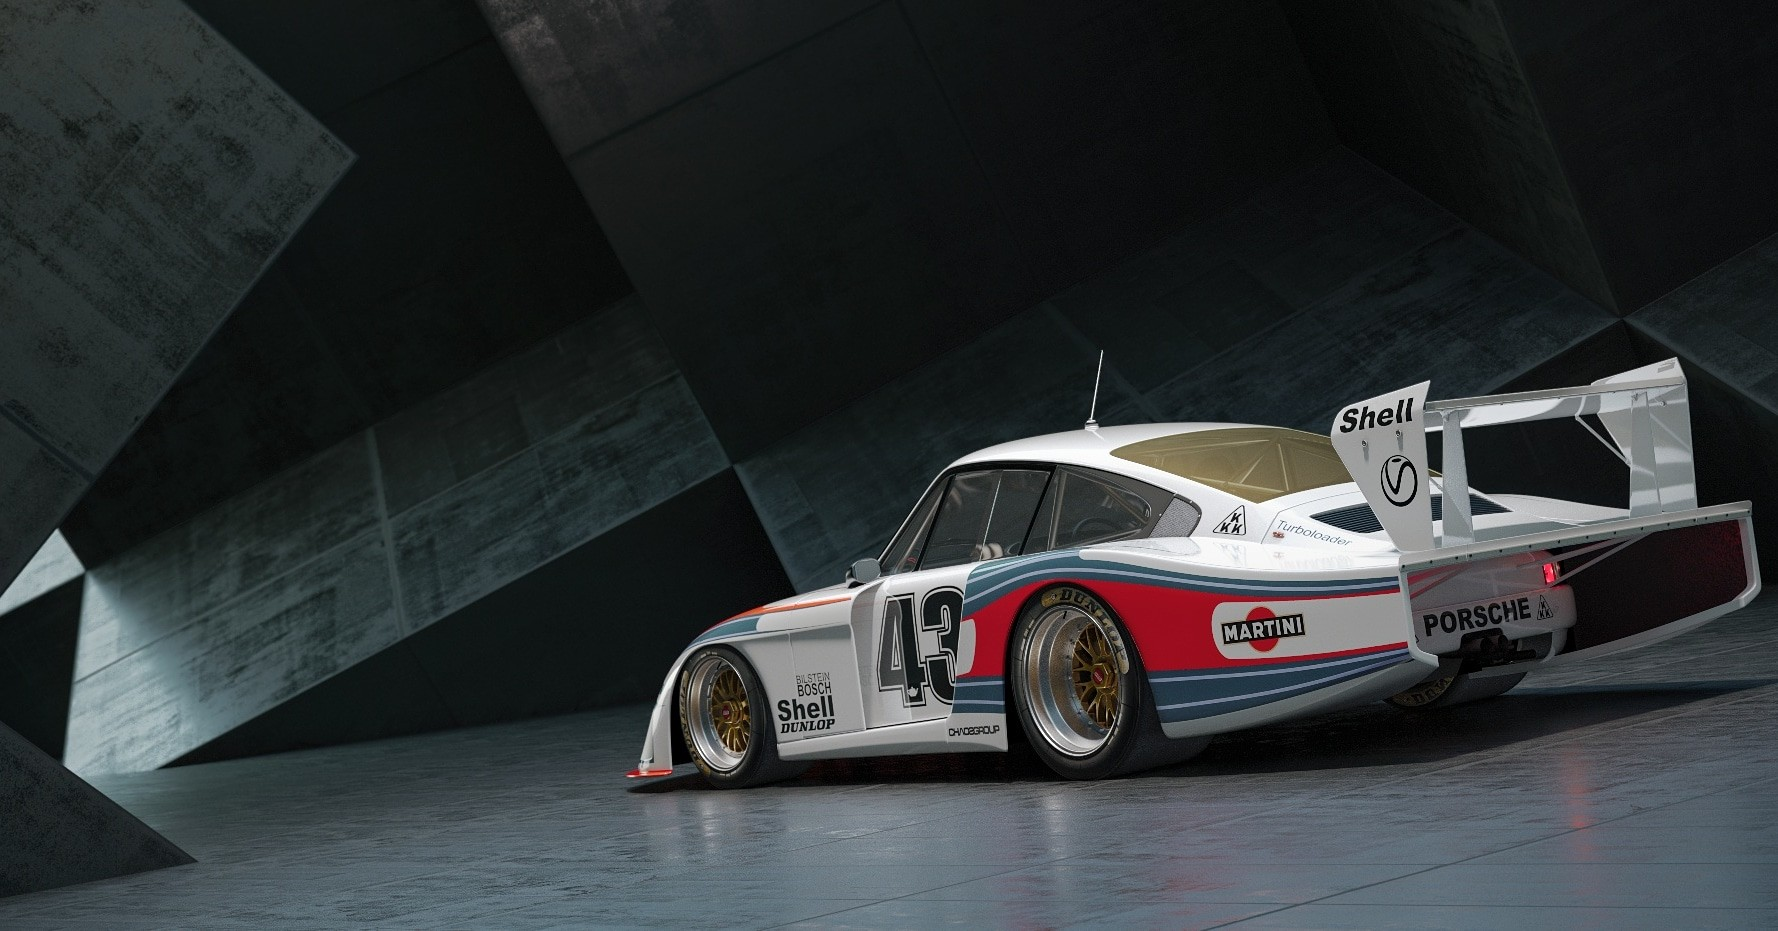 Javi Martinez Porsche 935 Mobidyc Le Mans 1976